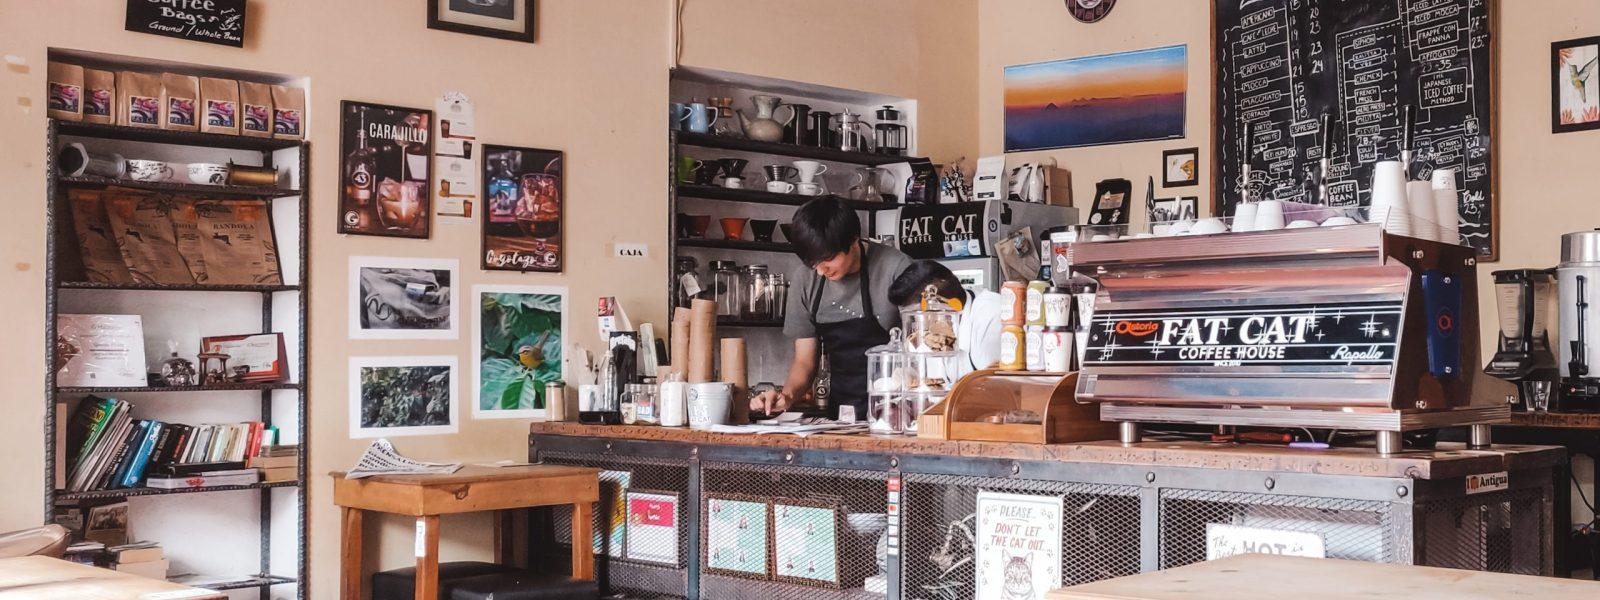 13x koffie in Antigua Guatemala